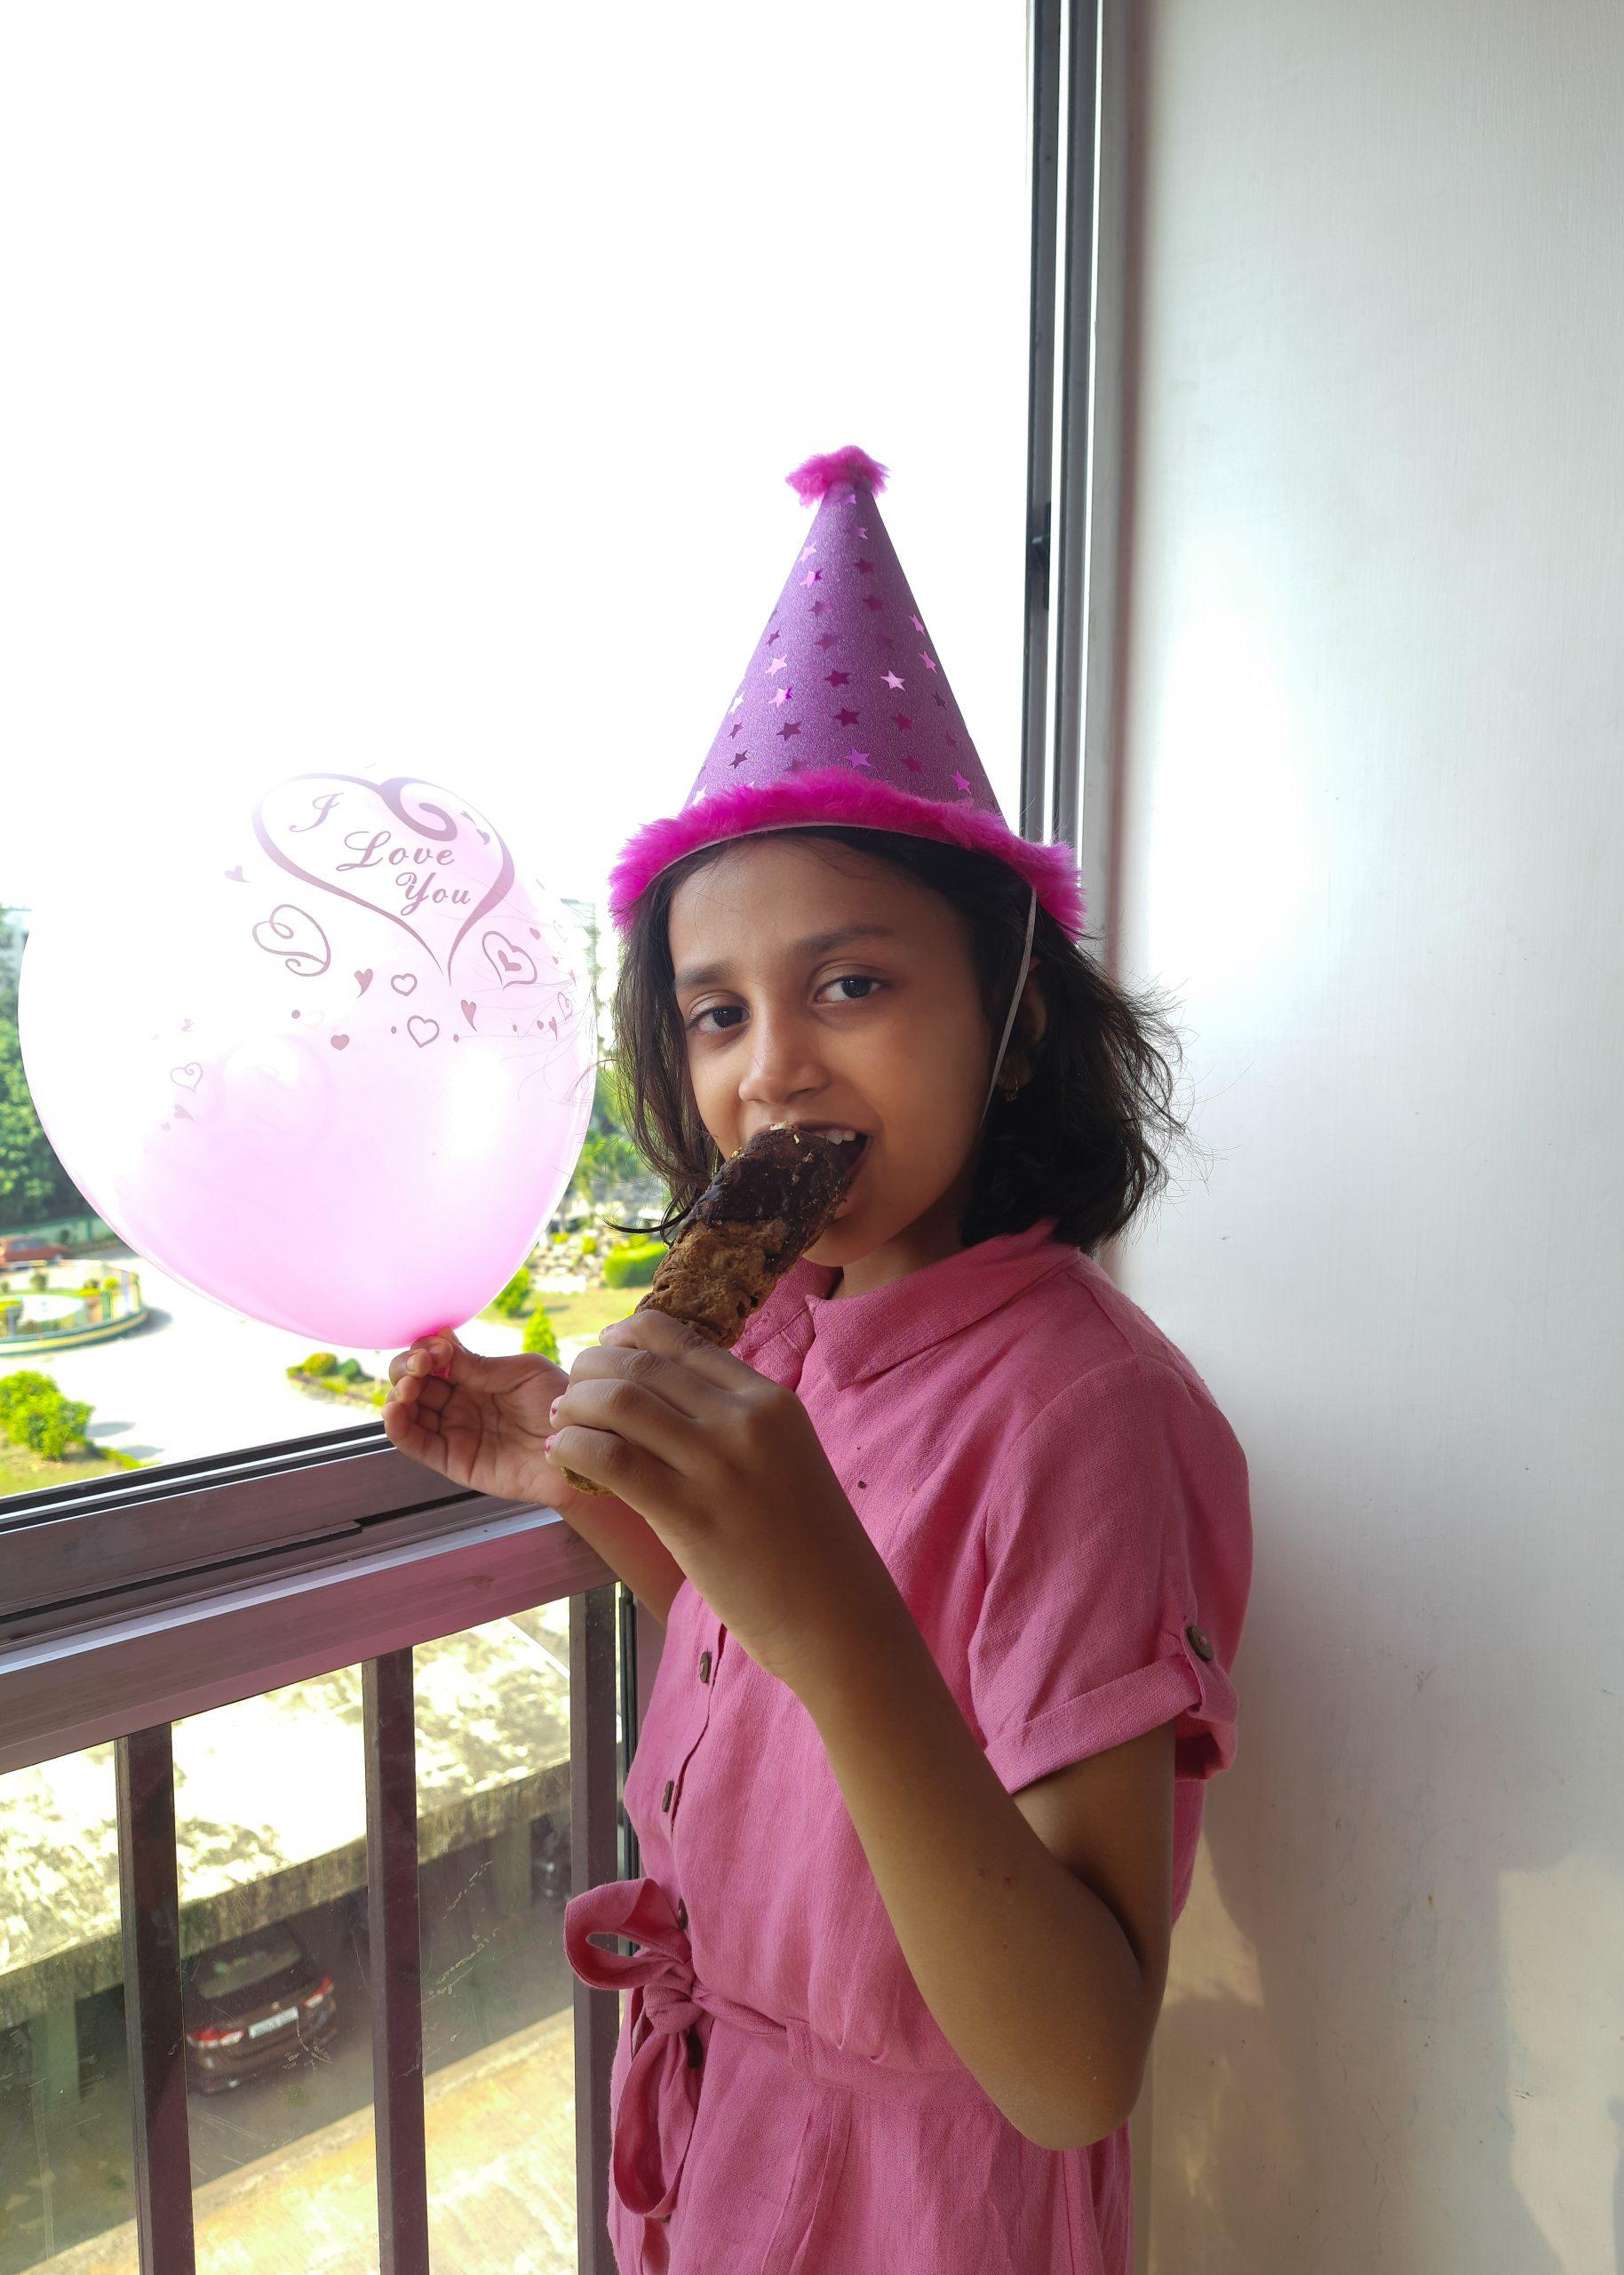 A birthday girl enjoying sweets at home